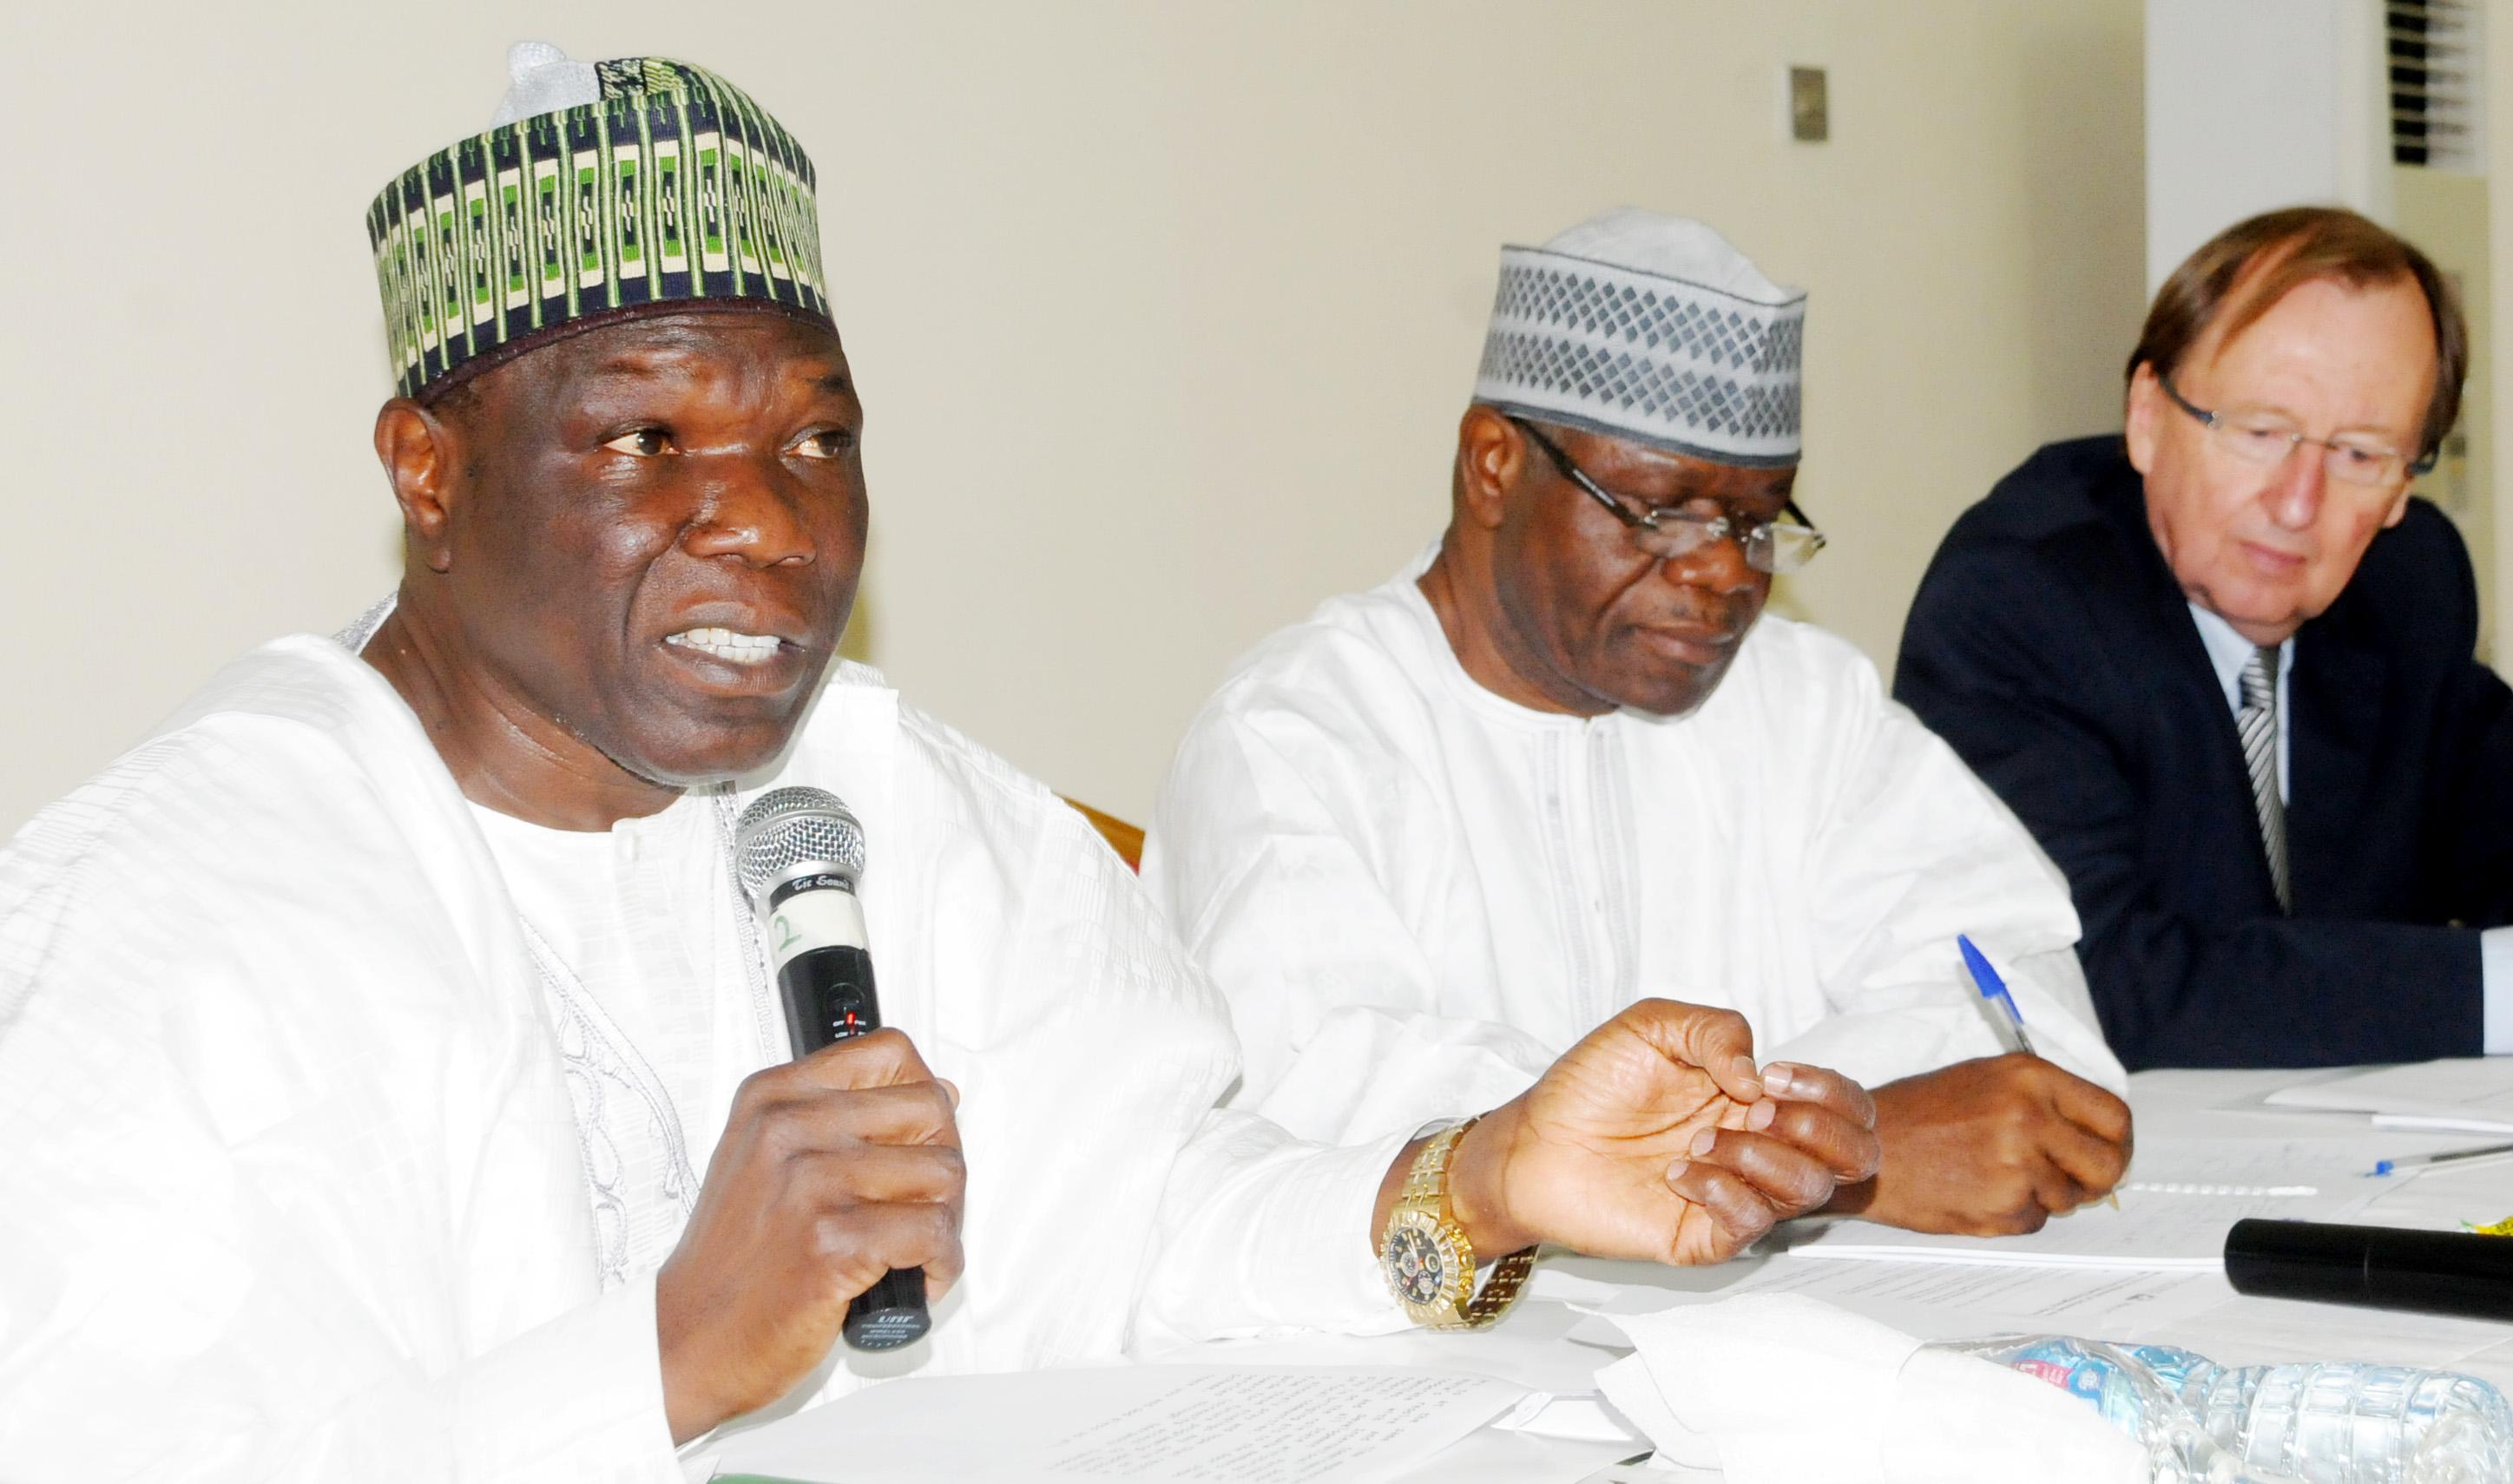 NURTW chairman emerges Vice President of International Transport Federation